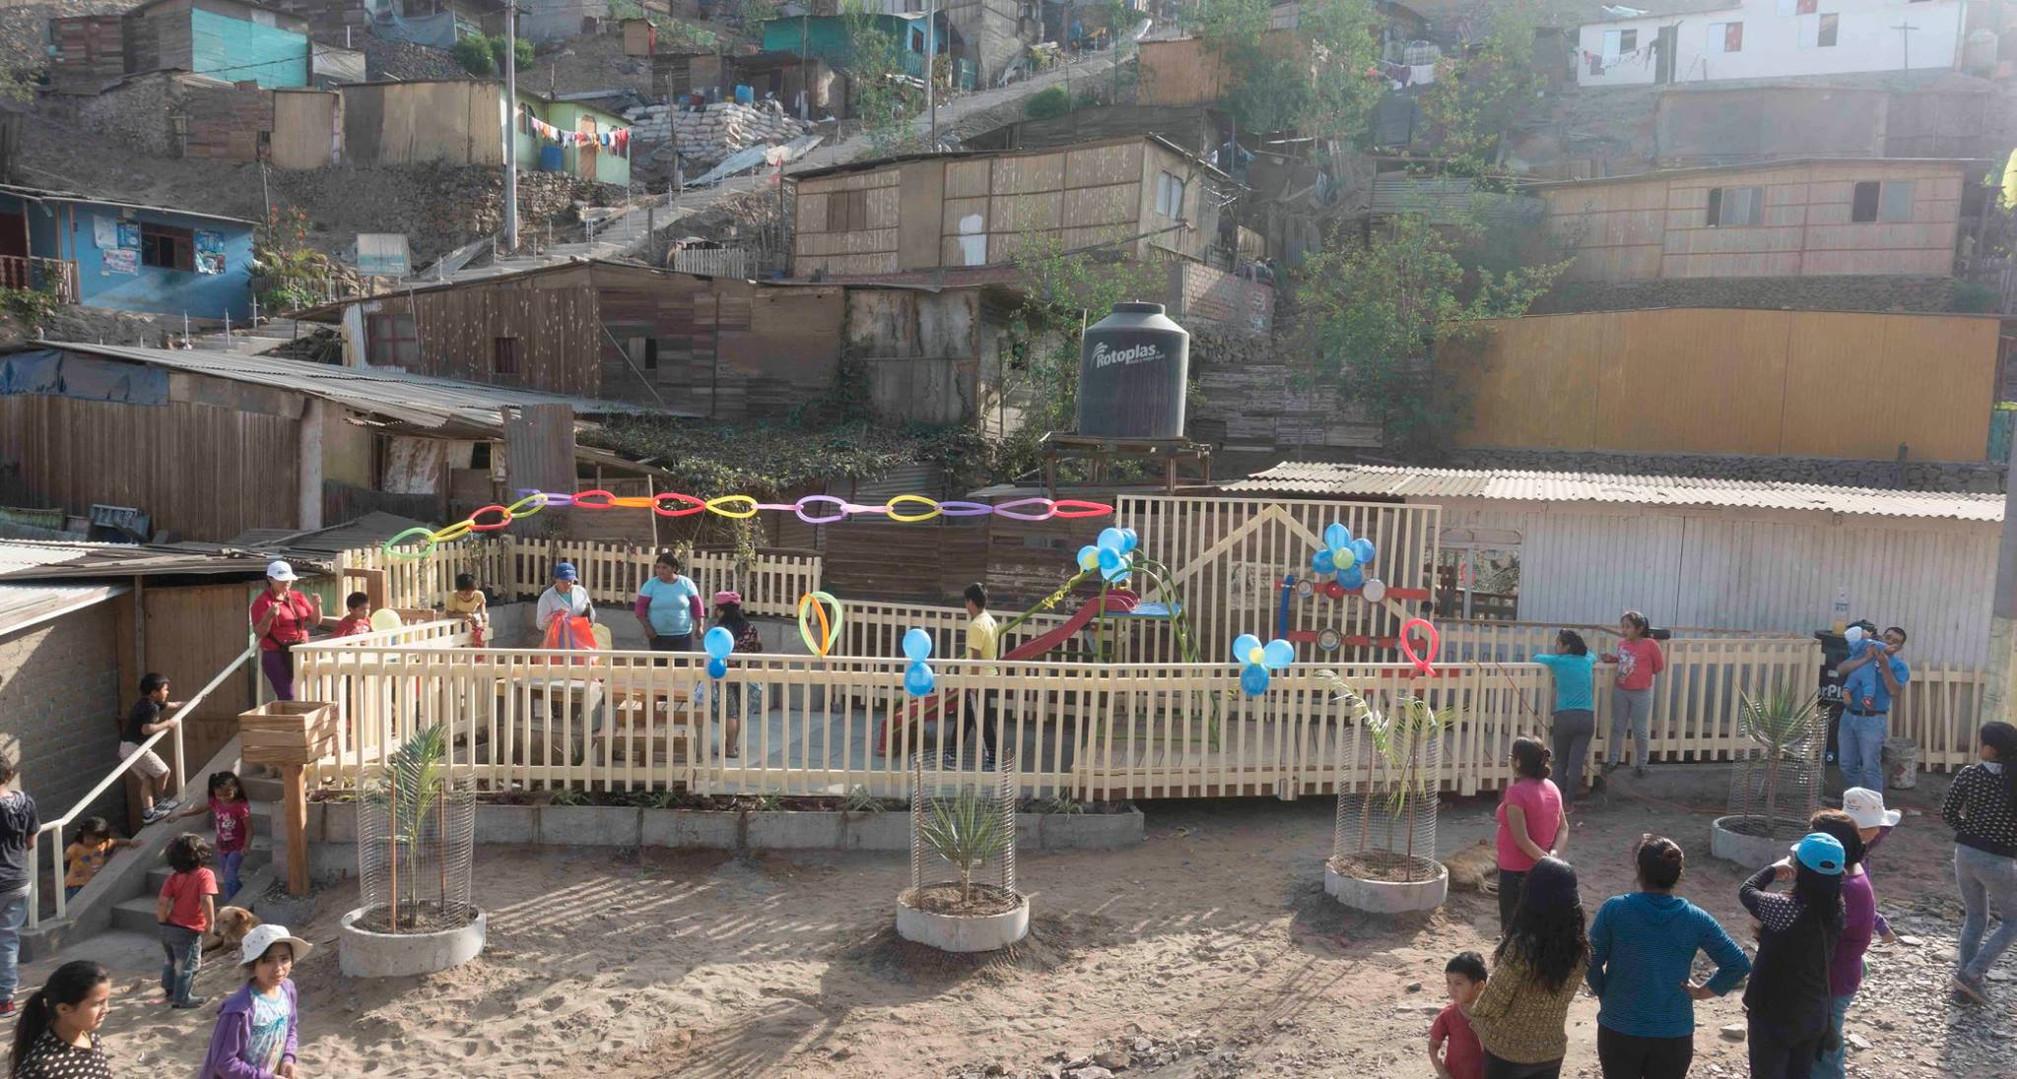 Lima Playground1_after.jpg